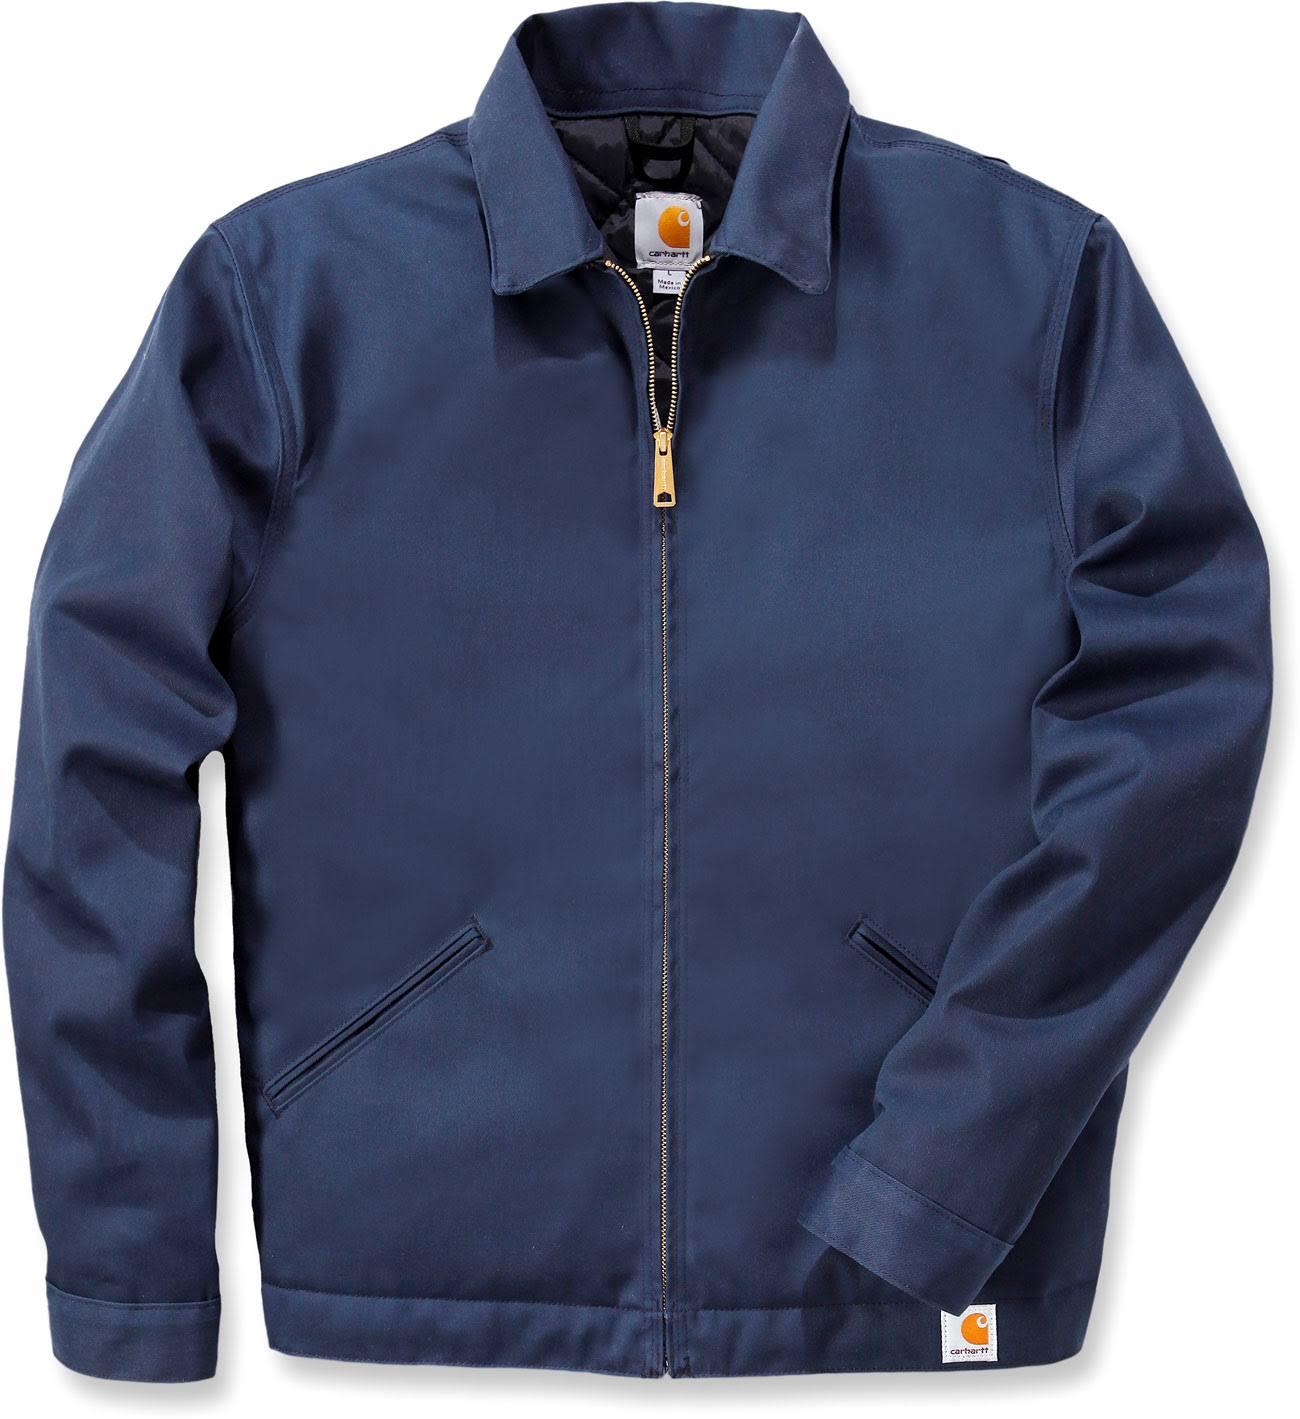 Nylon Trabajo Chaqueta Marino Forro De Para Recubierto Azul Sarga Con Abrigo Hombre Ajustable Carhartt qzg0Hw0